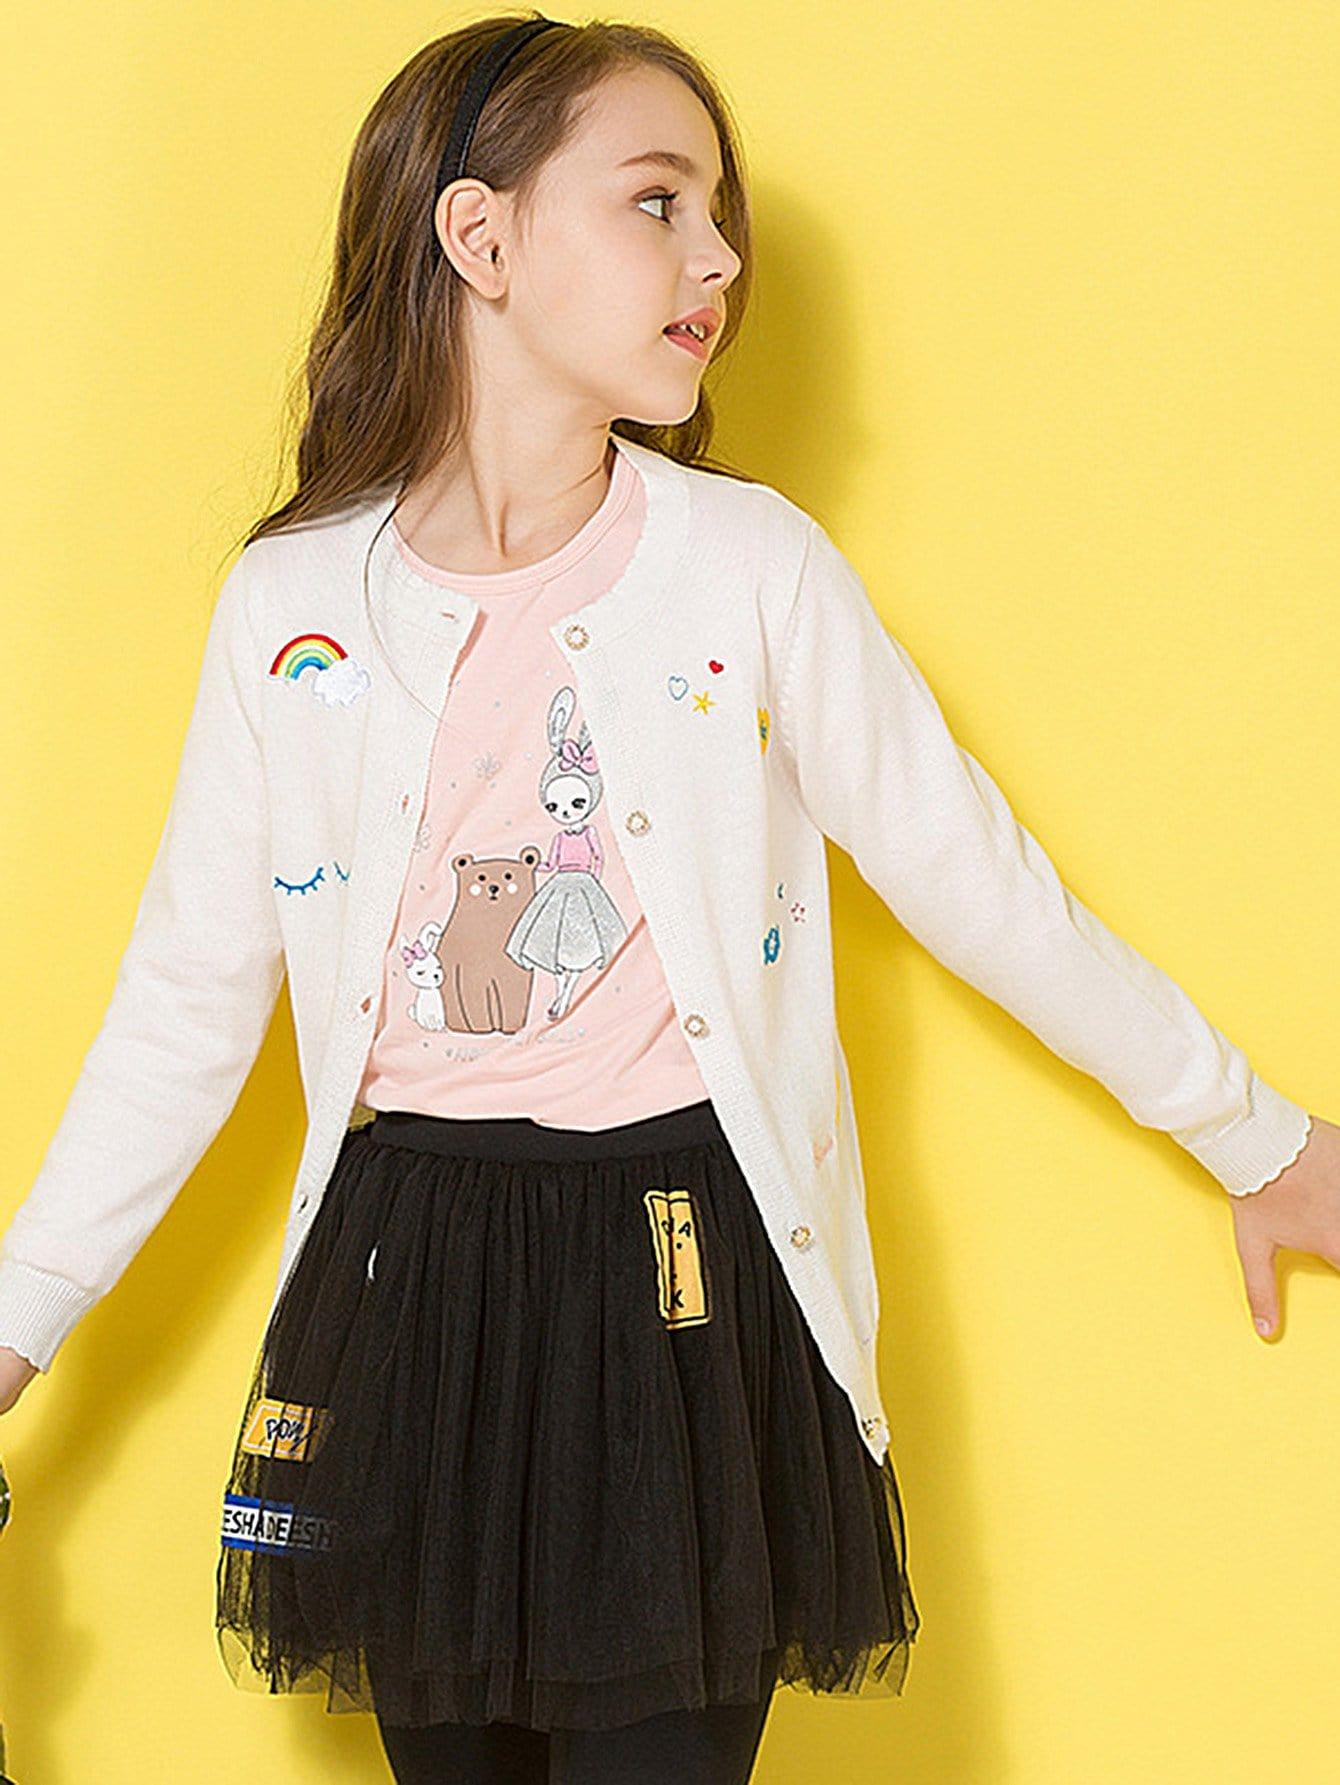 Girls Cartoon Embroidered Sweater